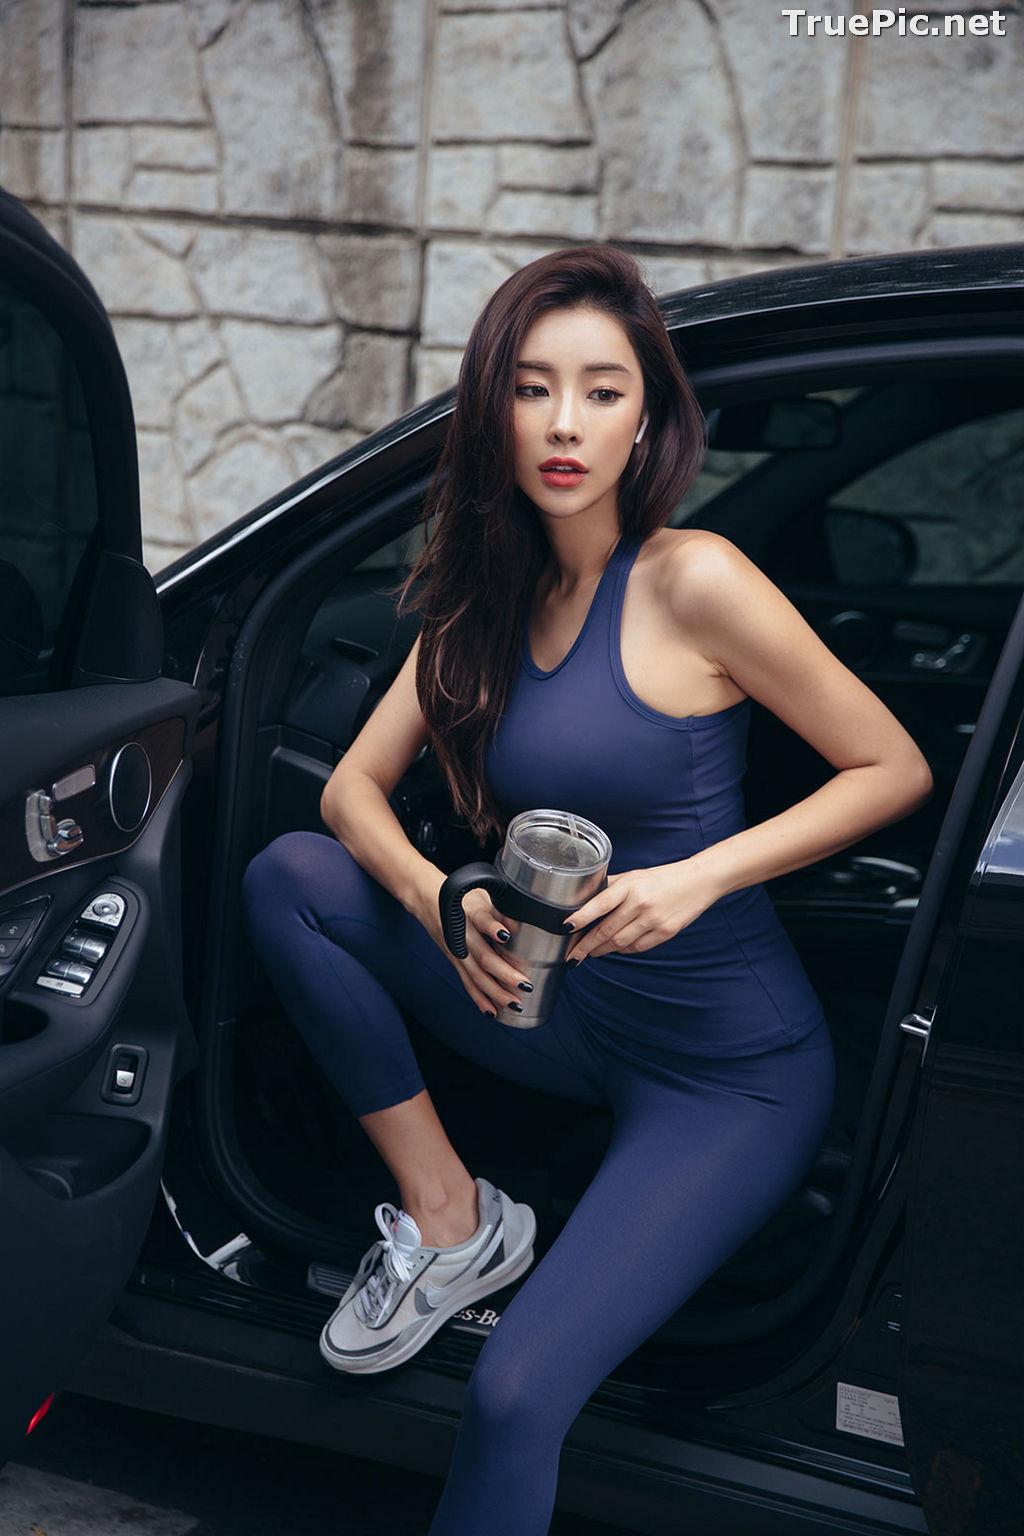 Image Korean Fashion Model - Park Da Hyun - Navy Sportswear - TruePic.net - Picture-13